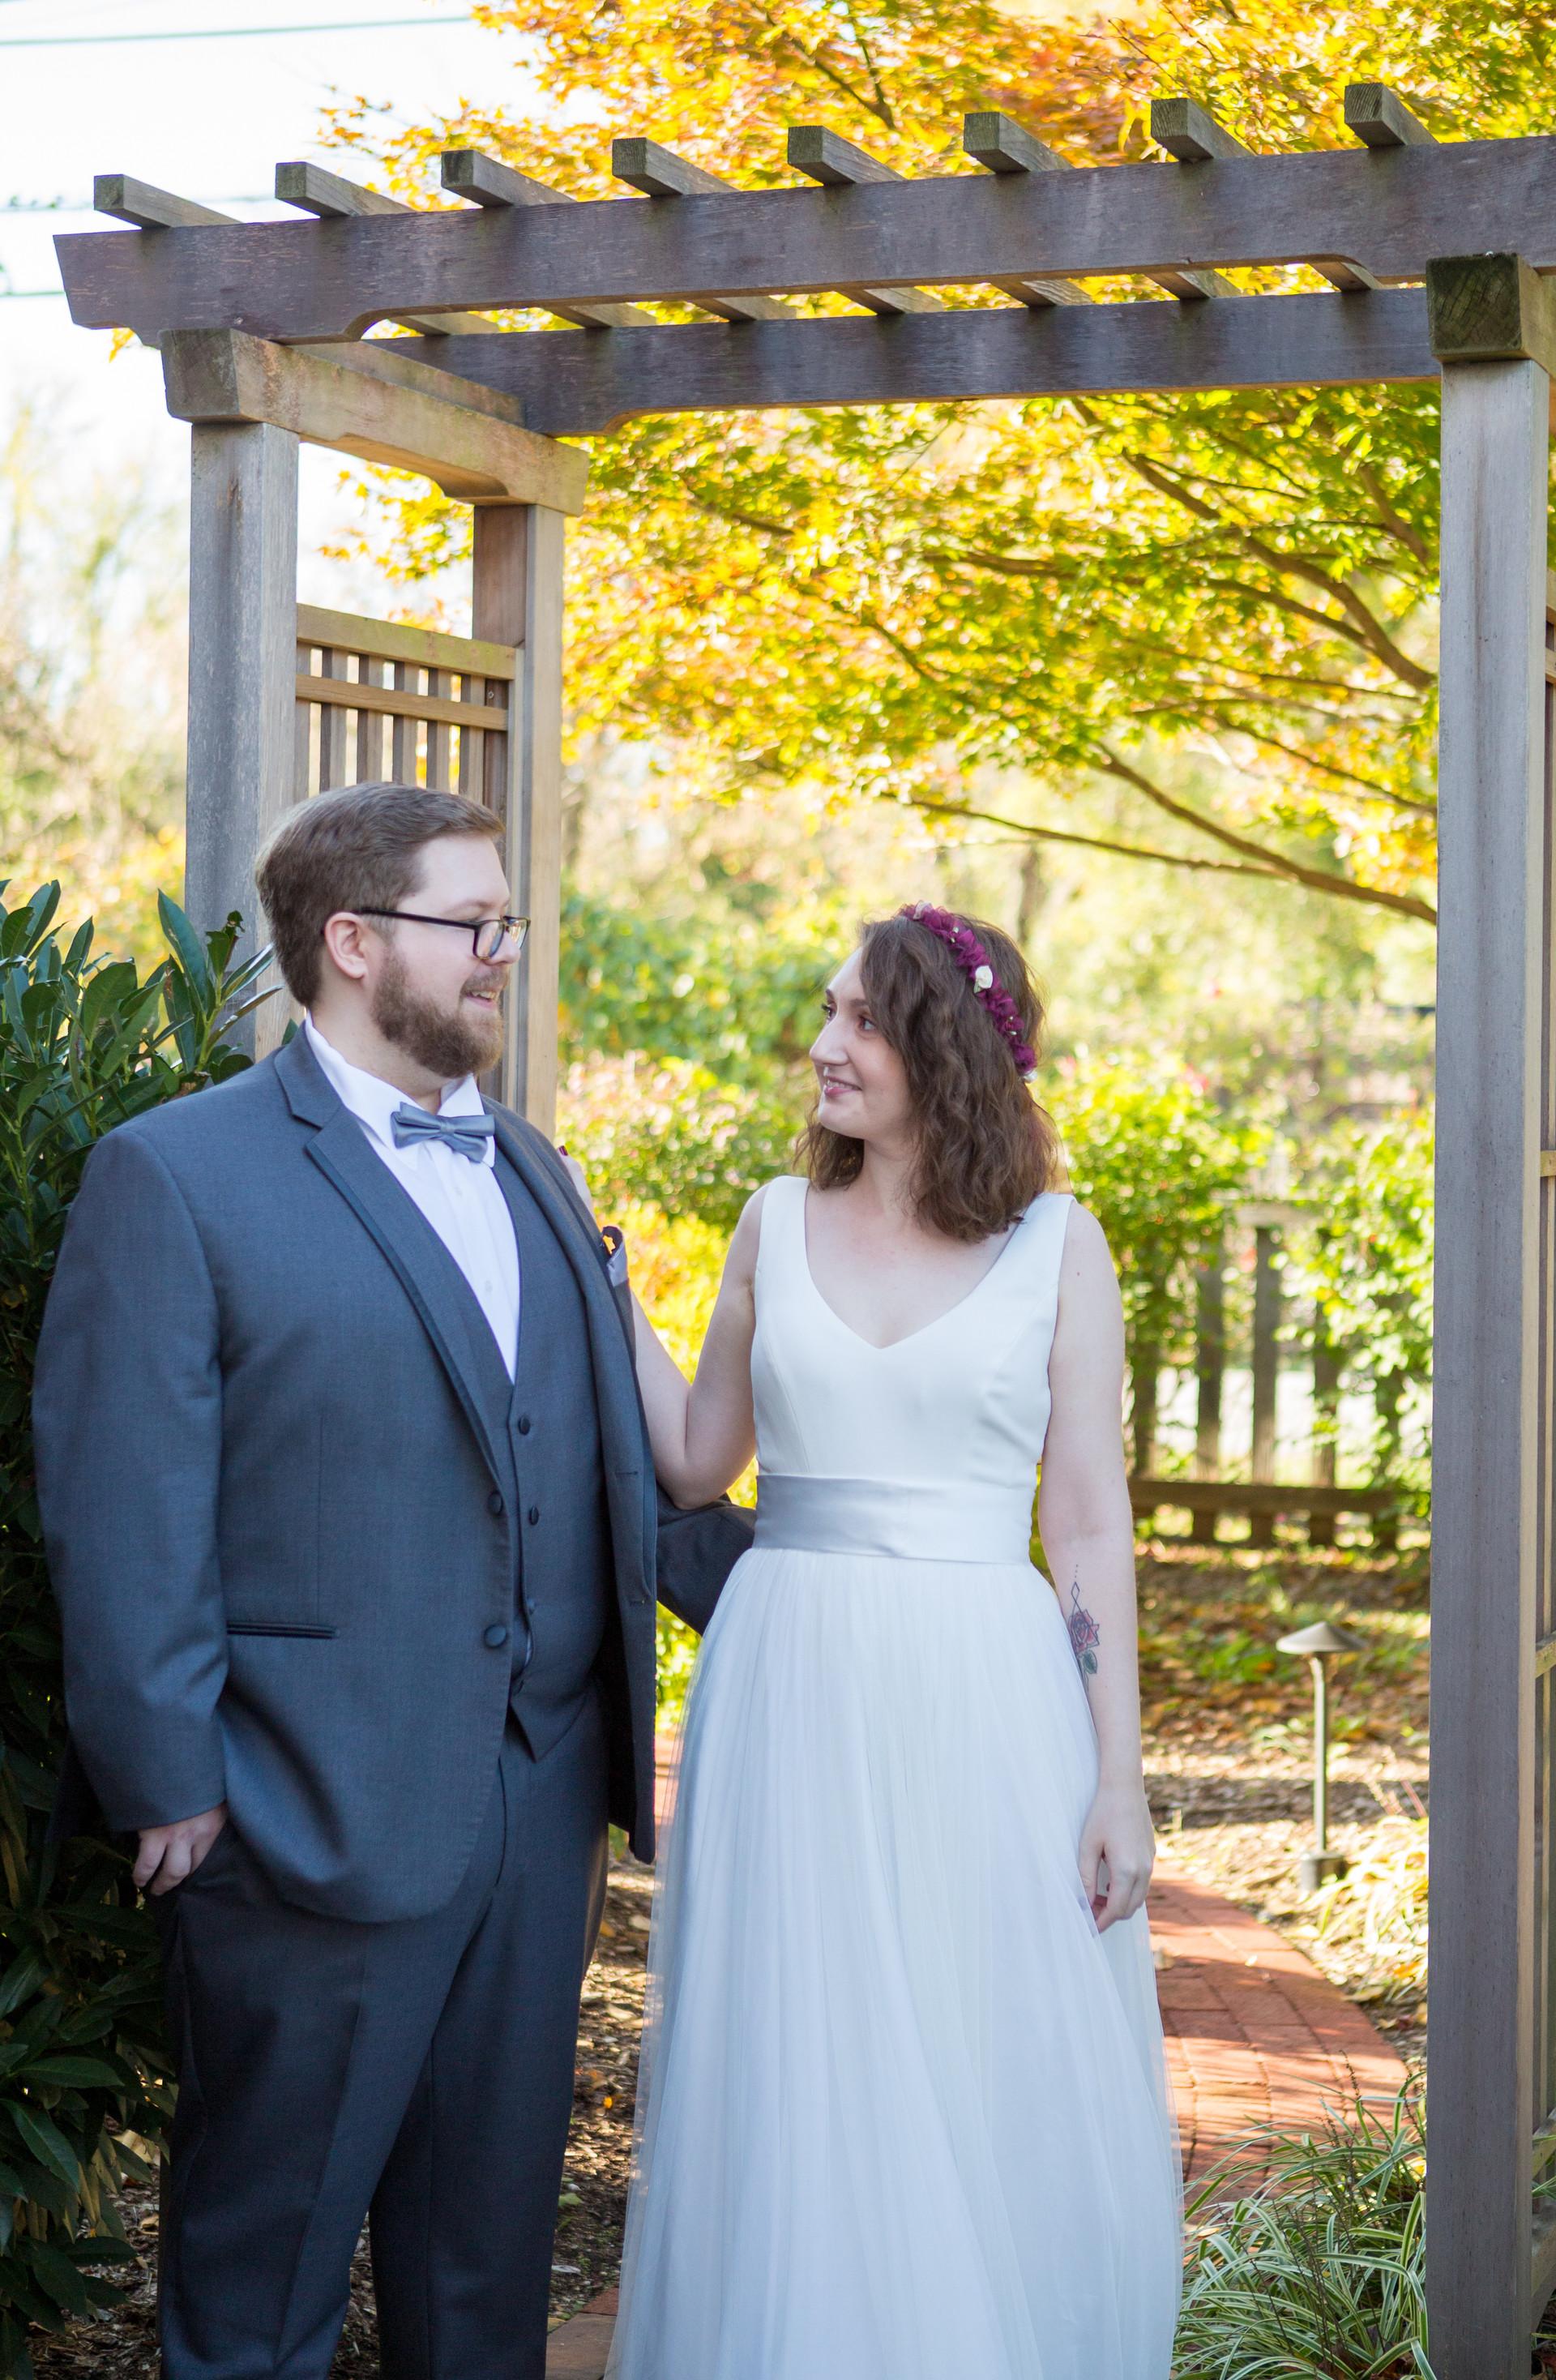 Colburn_Wedding_11-1-2019_42813.jpg